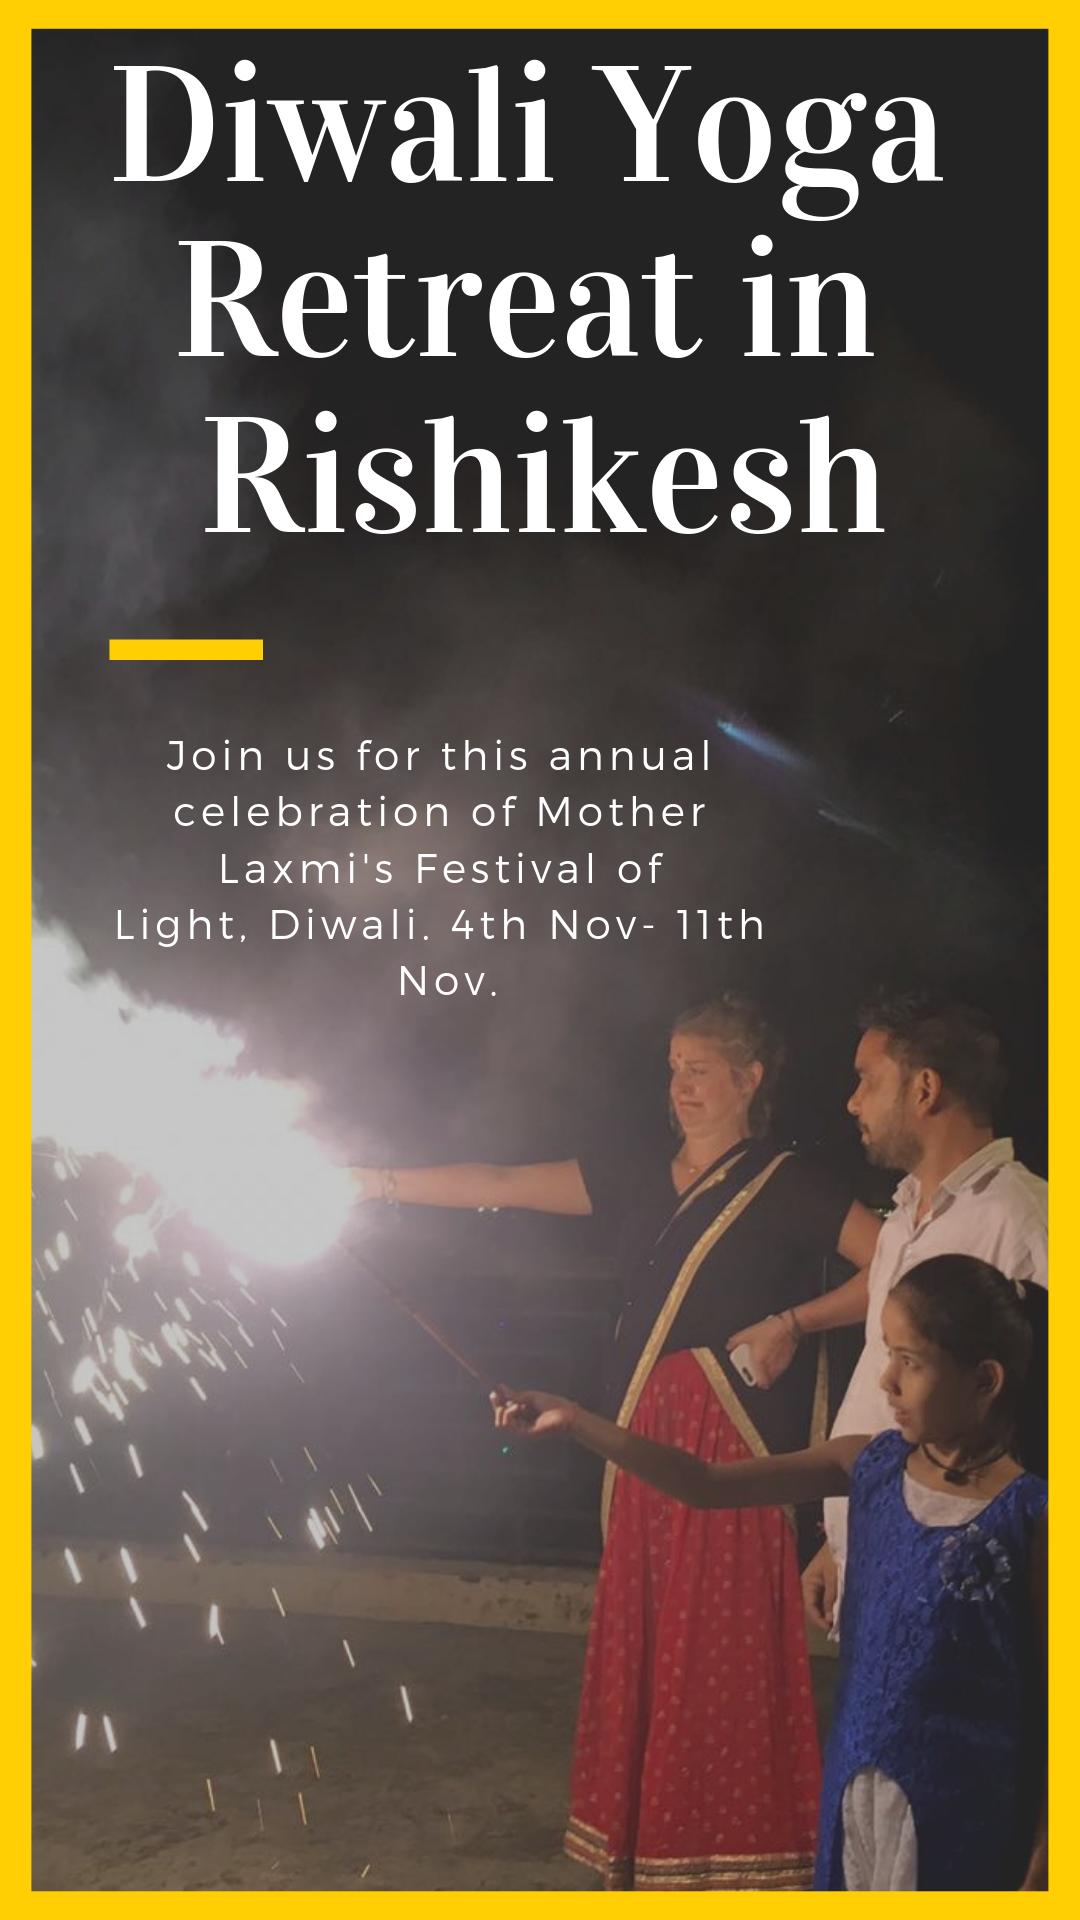 Rishikesh Yoga #Retreats invites you all for 7 days #Diwali